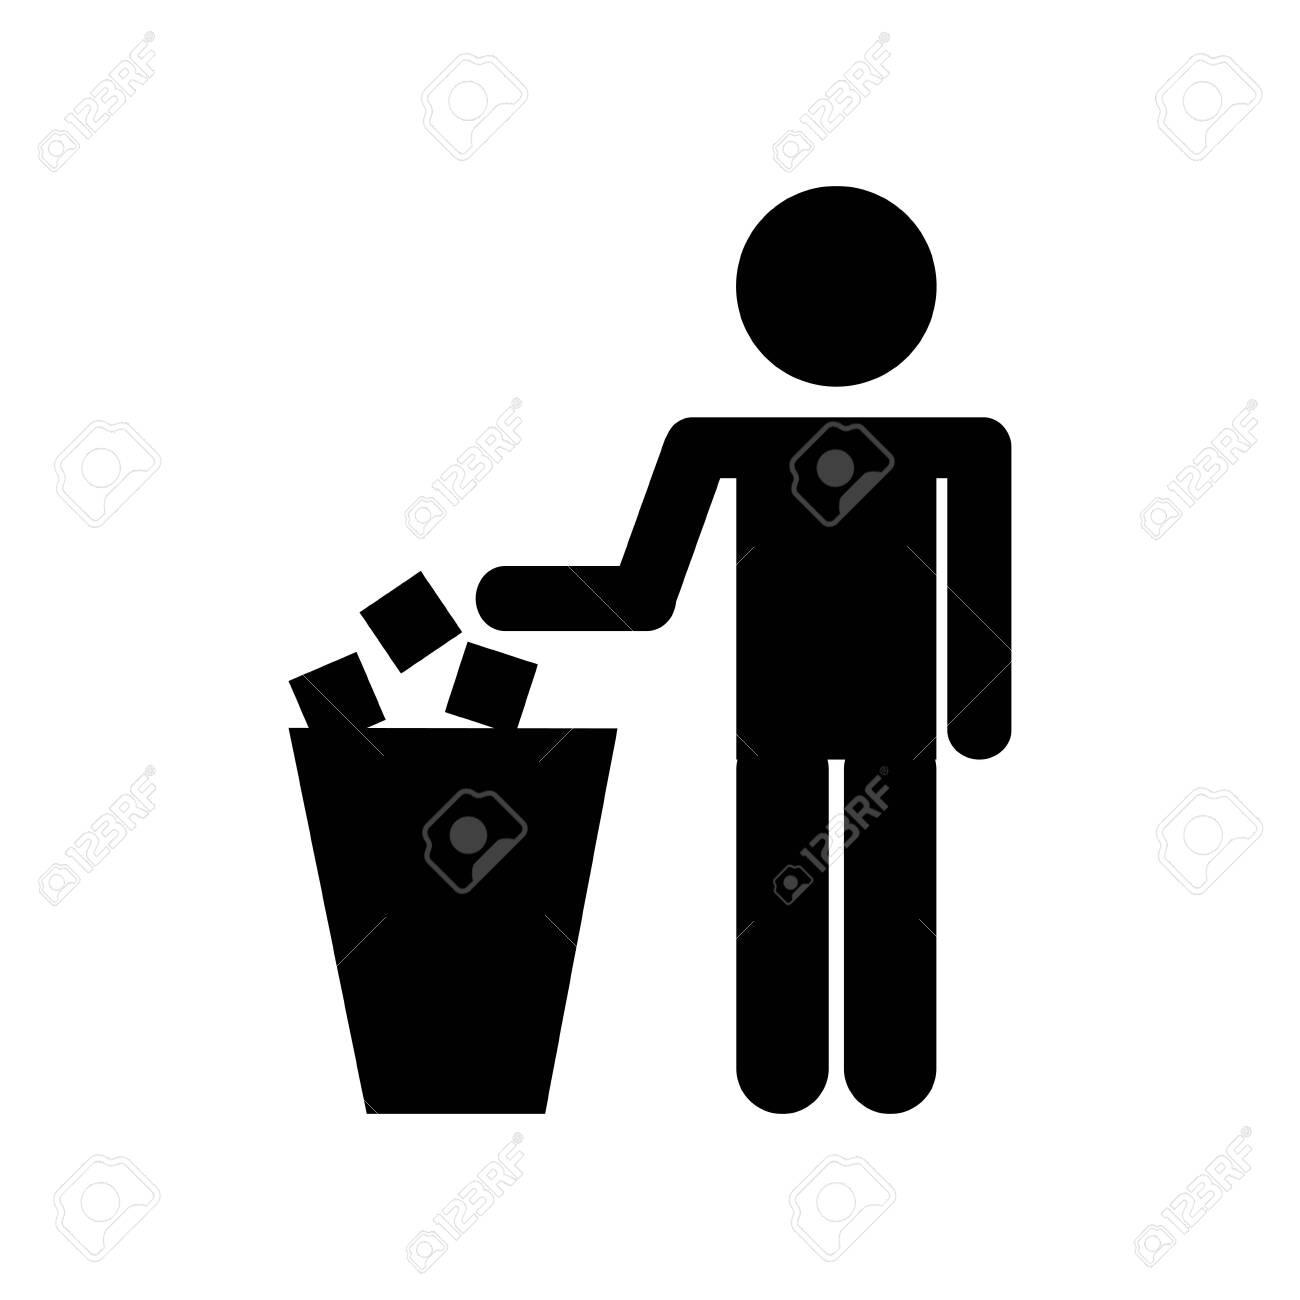 person silhouette with garbage bin vector illustration design - 121010913